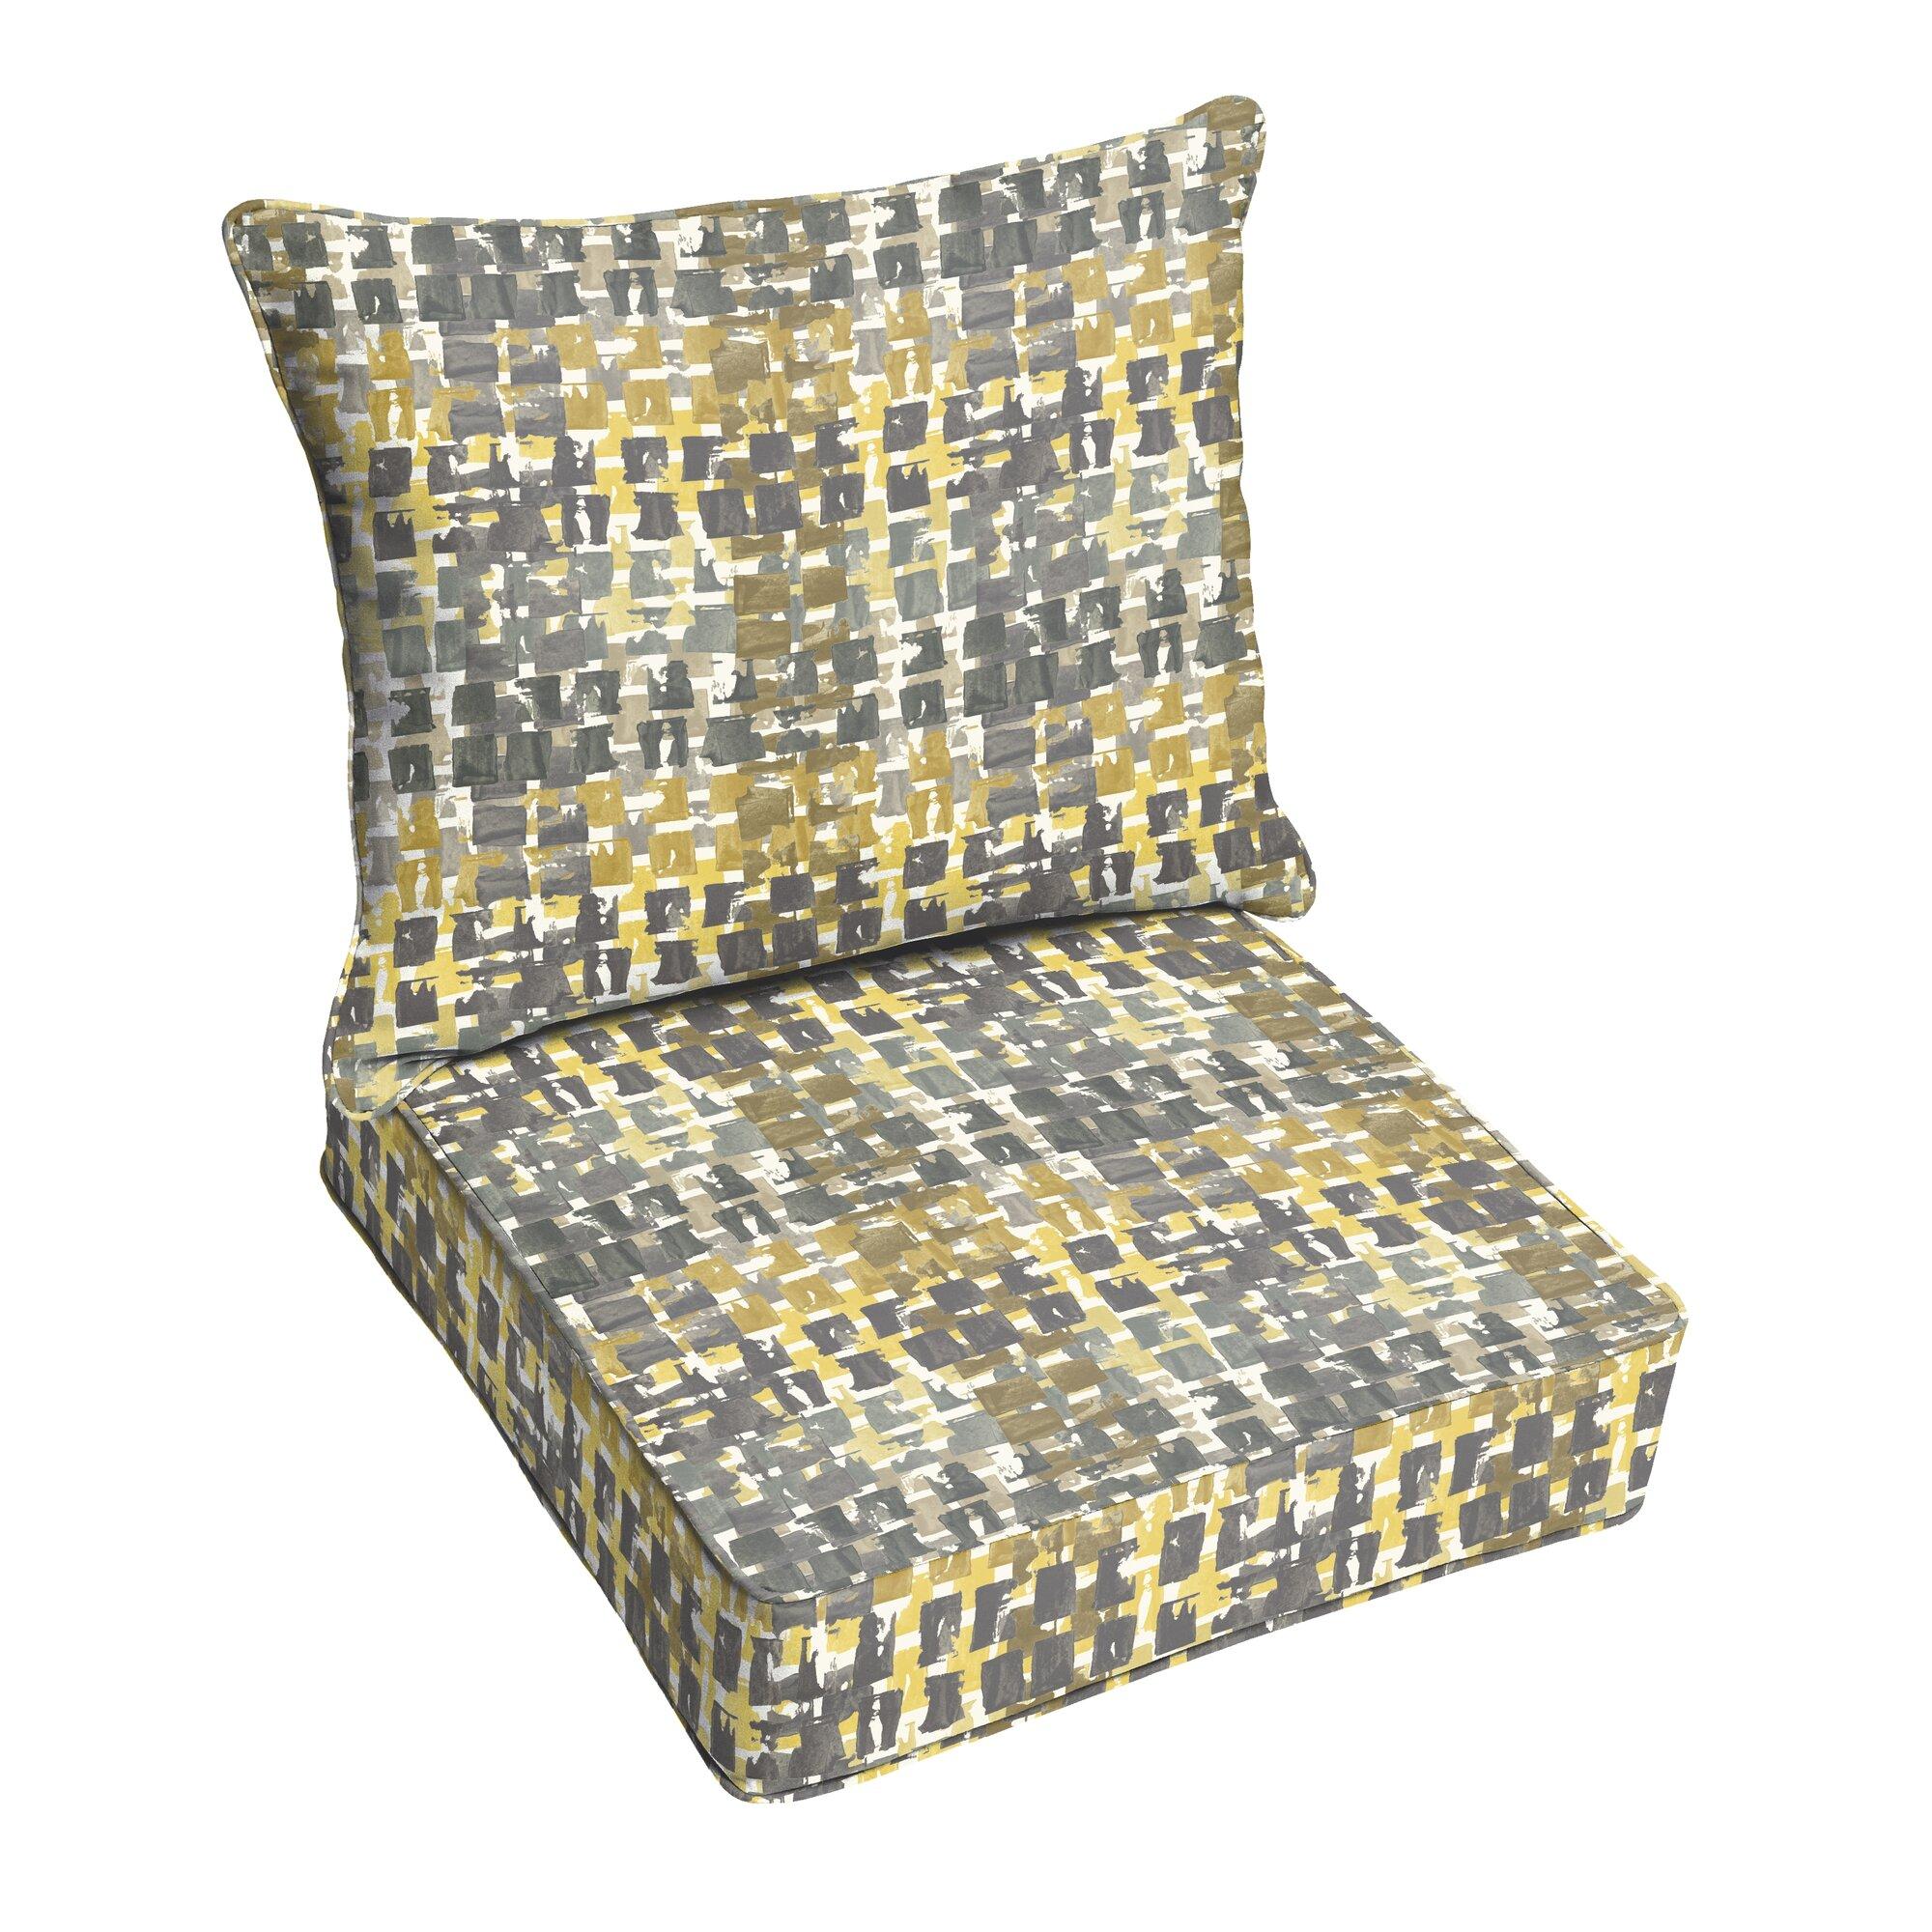 Brayden Studio Outdoor Lounge Chair Cushion